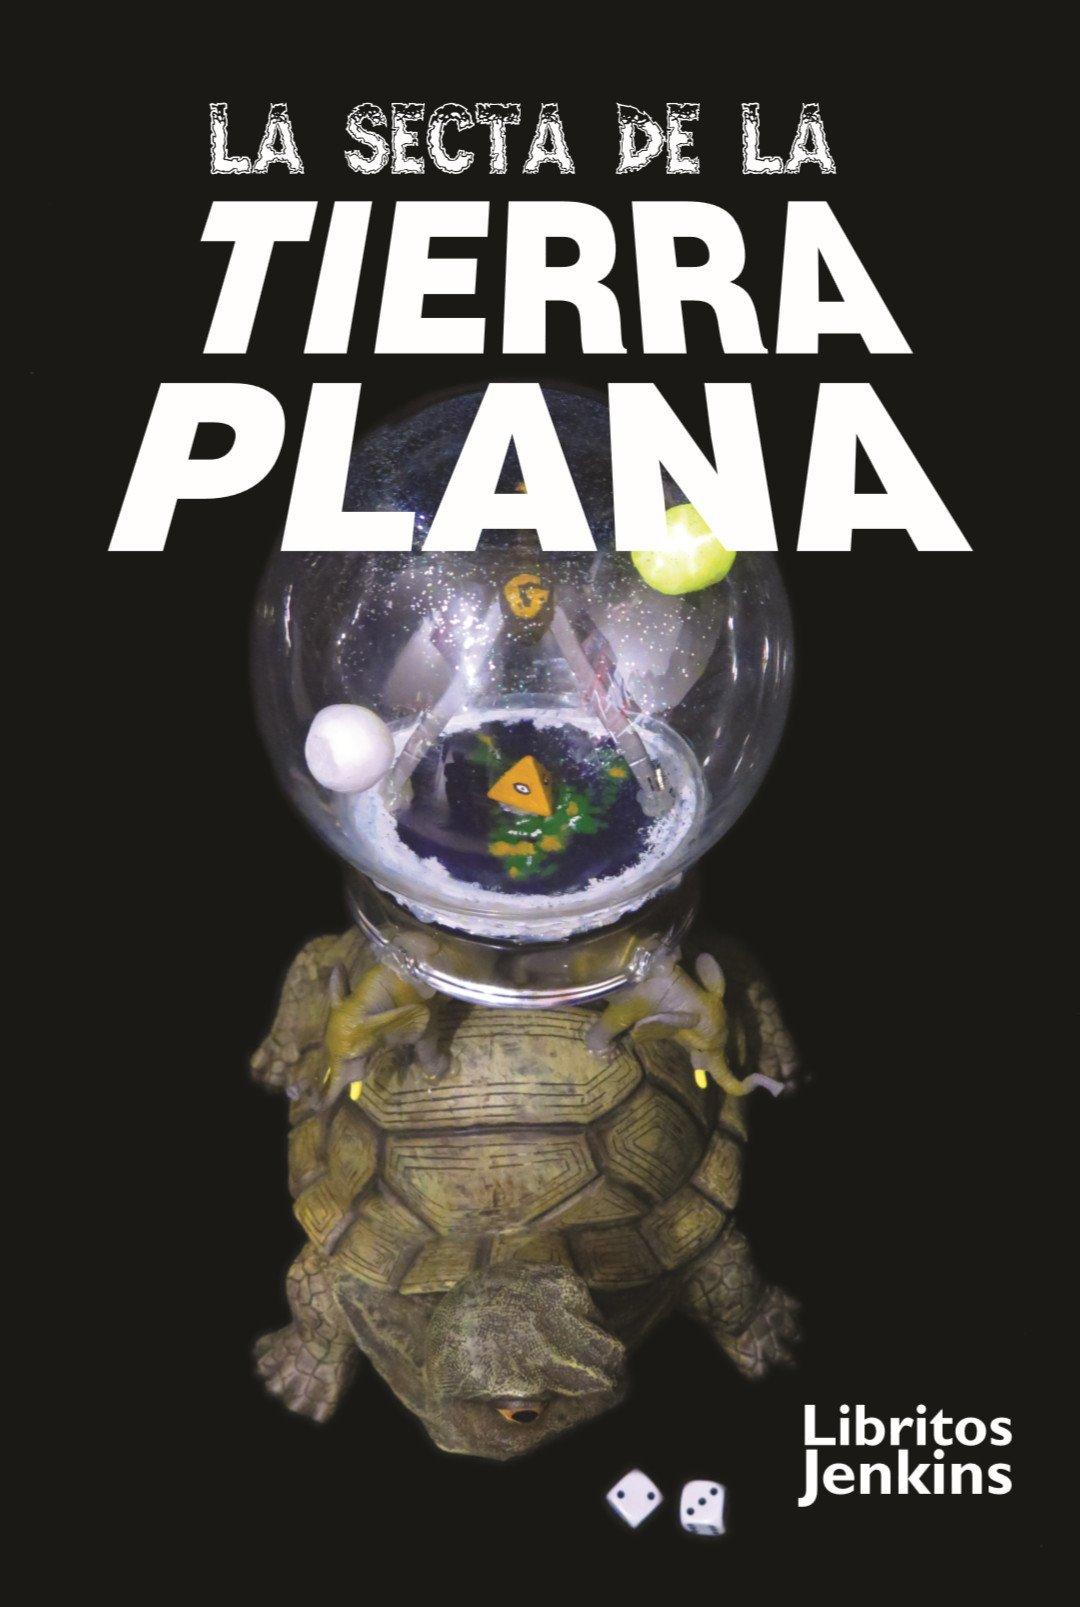 LA SECTA DE LA TIERRA PLANA